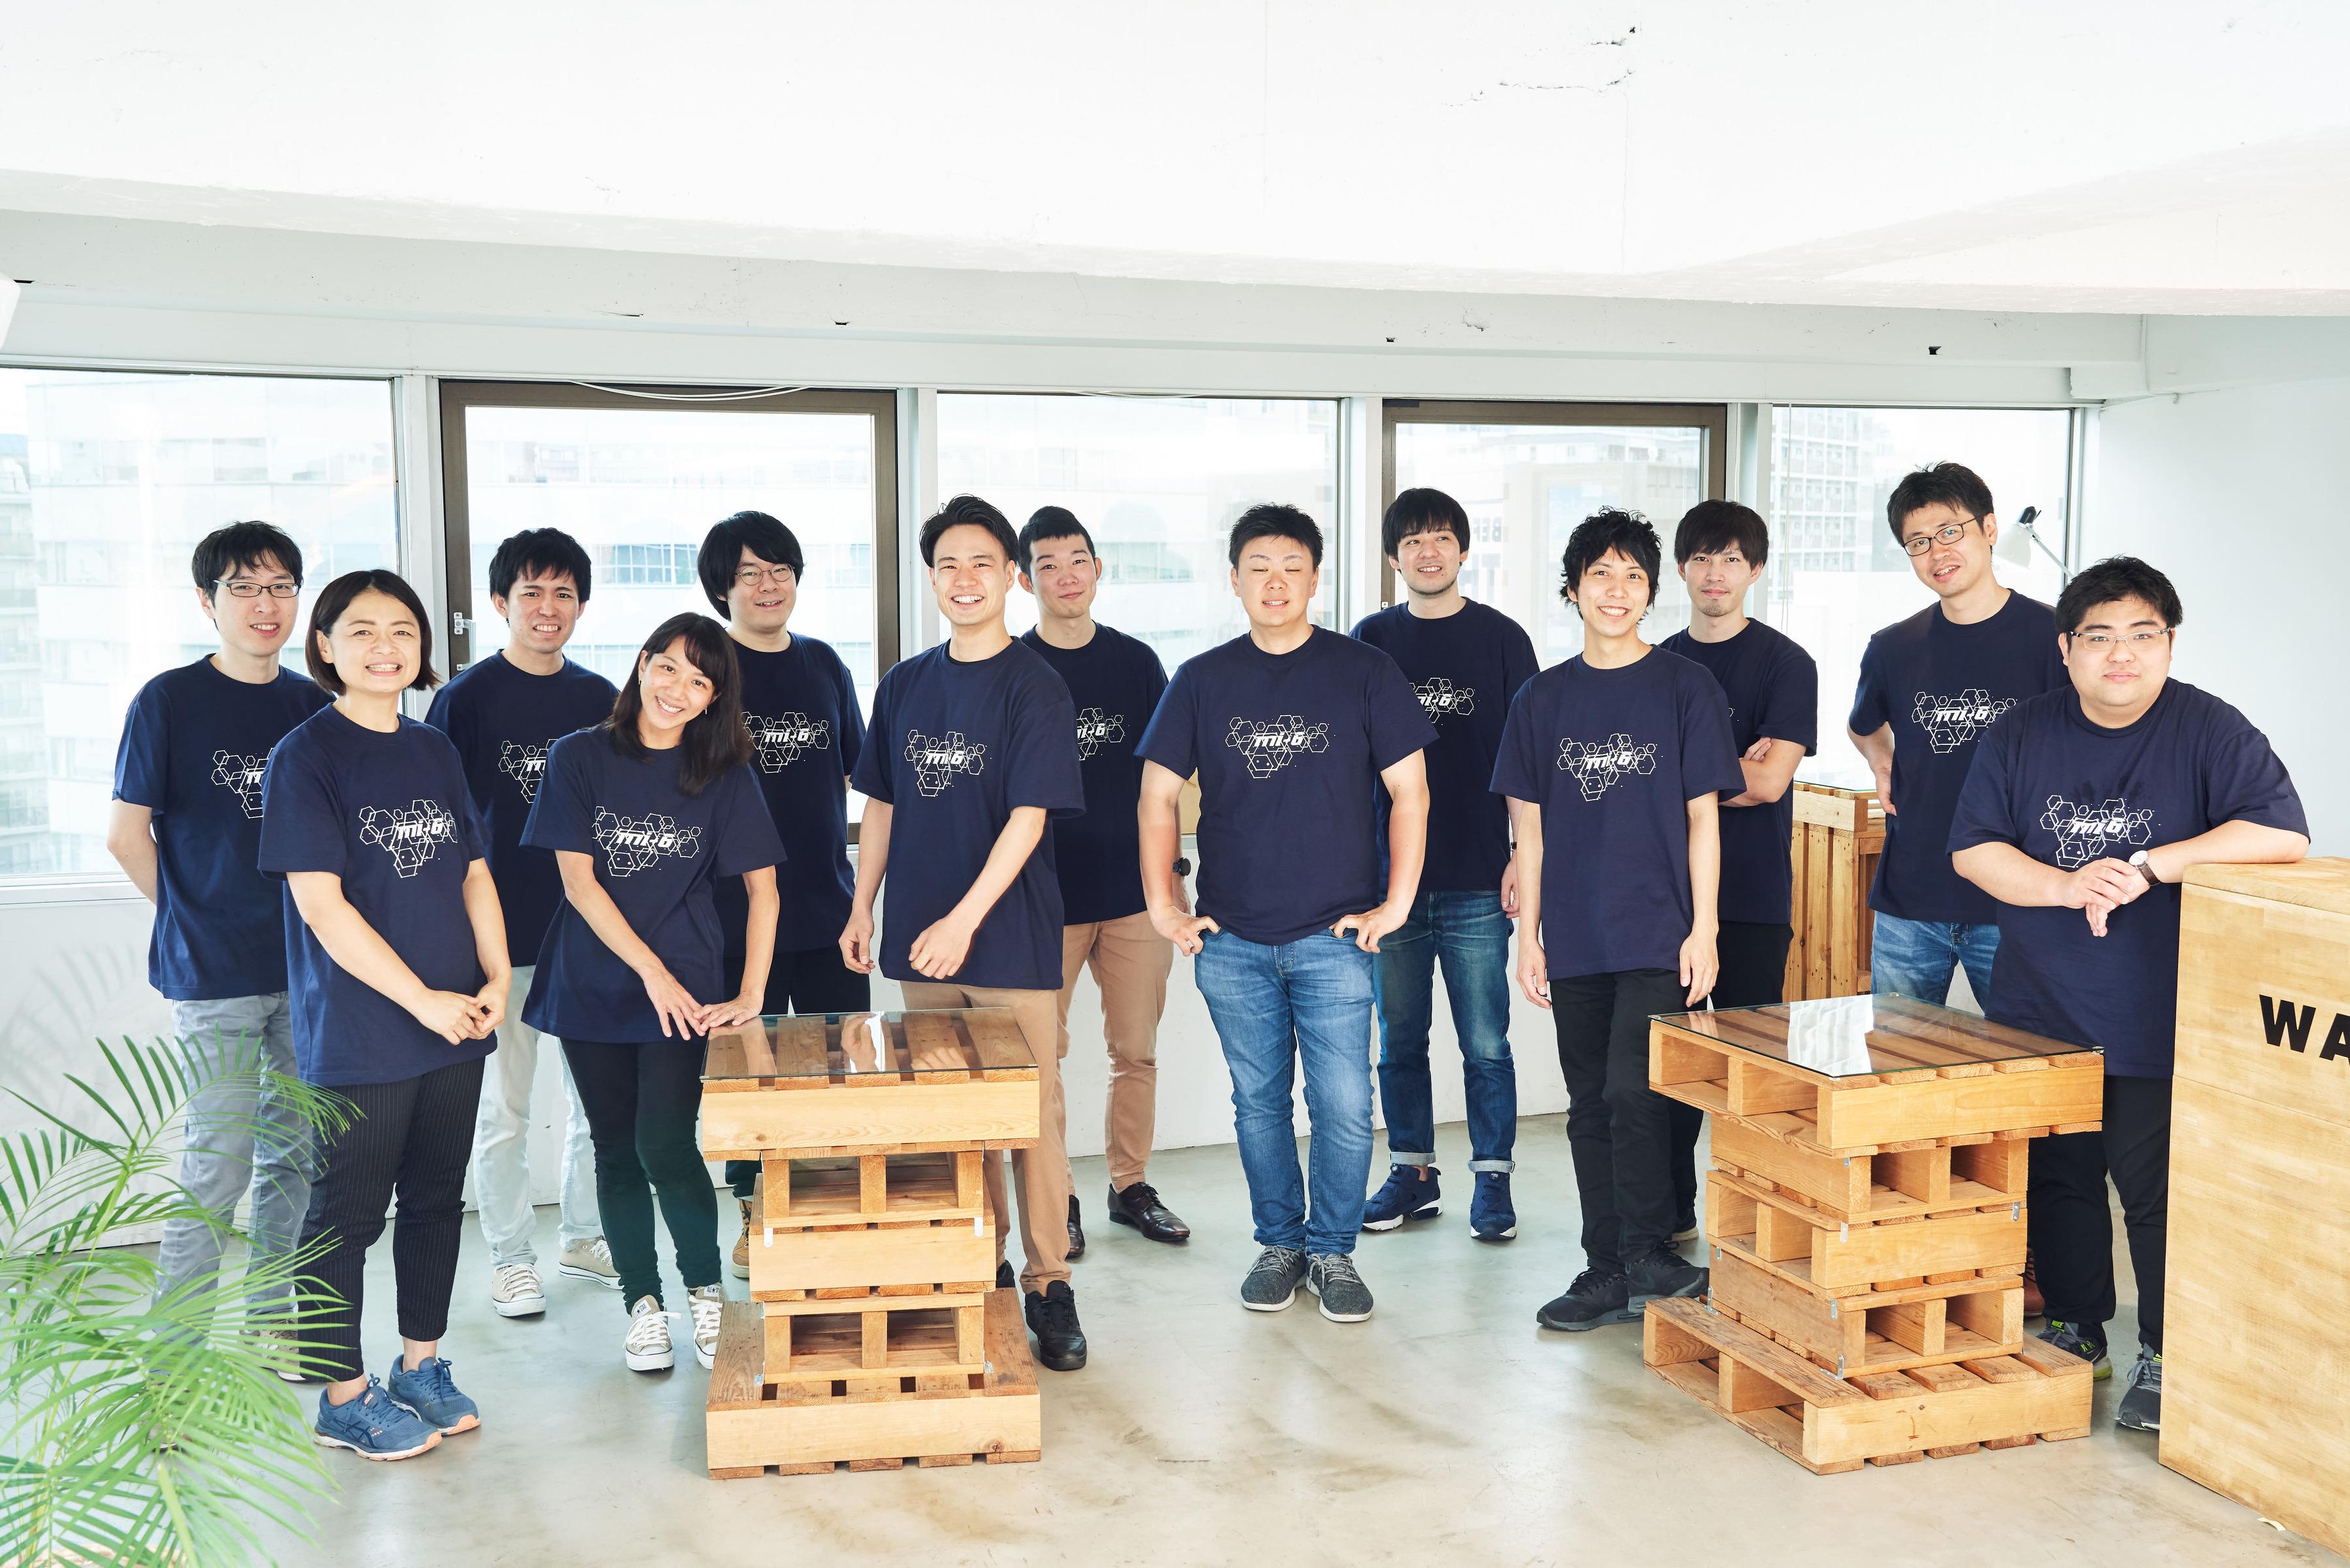 ICCカタパルト優勝!業界注目のSaaS開発を担う機械学習エンジニア